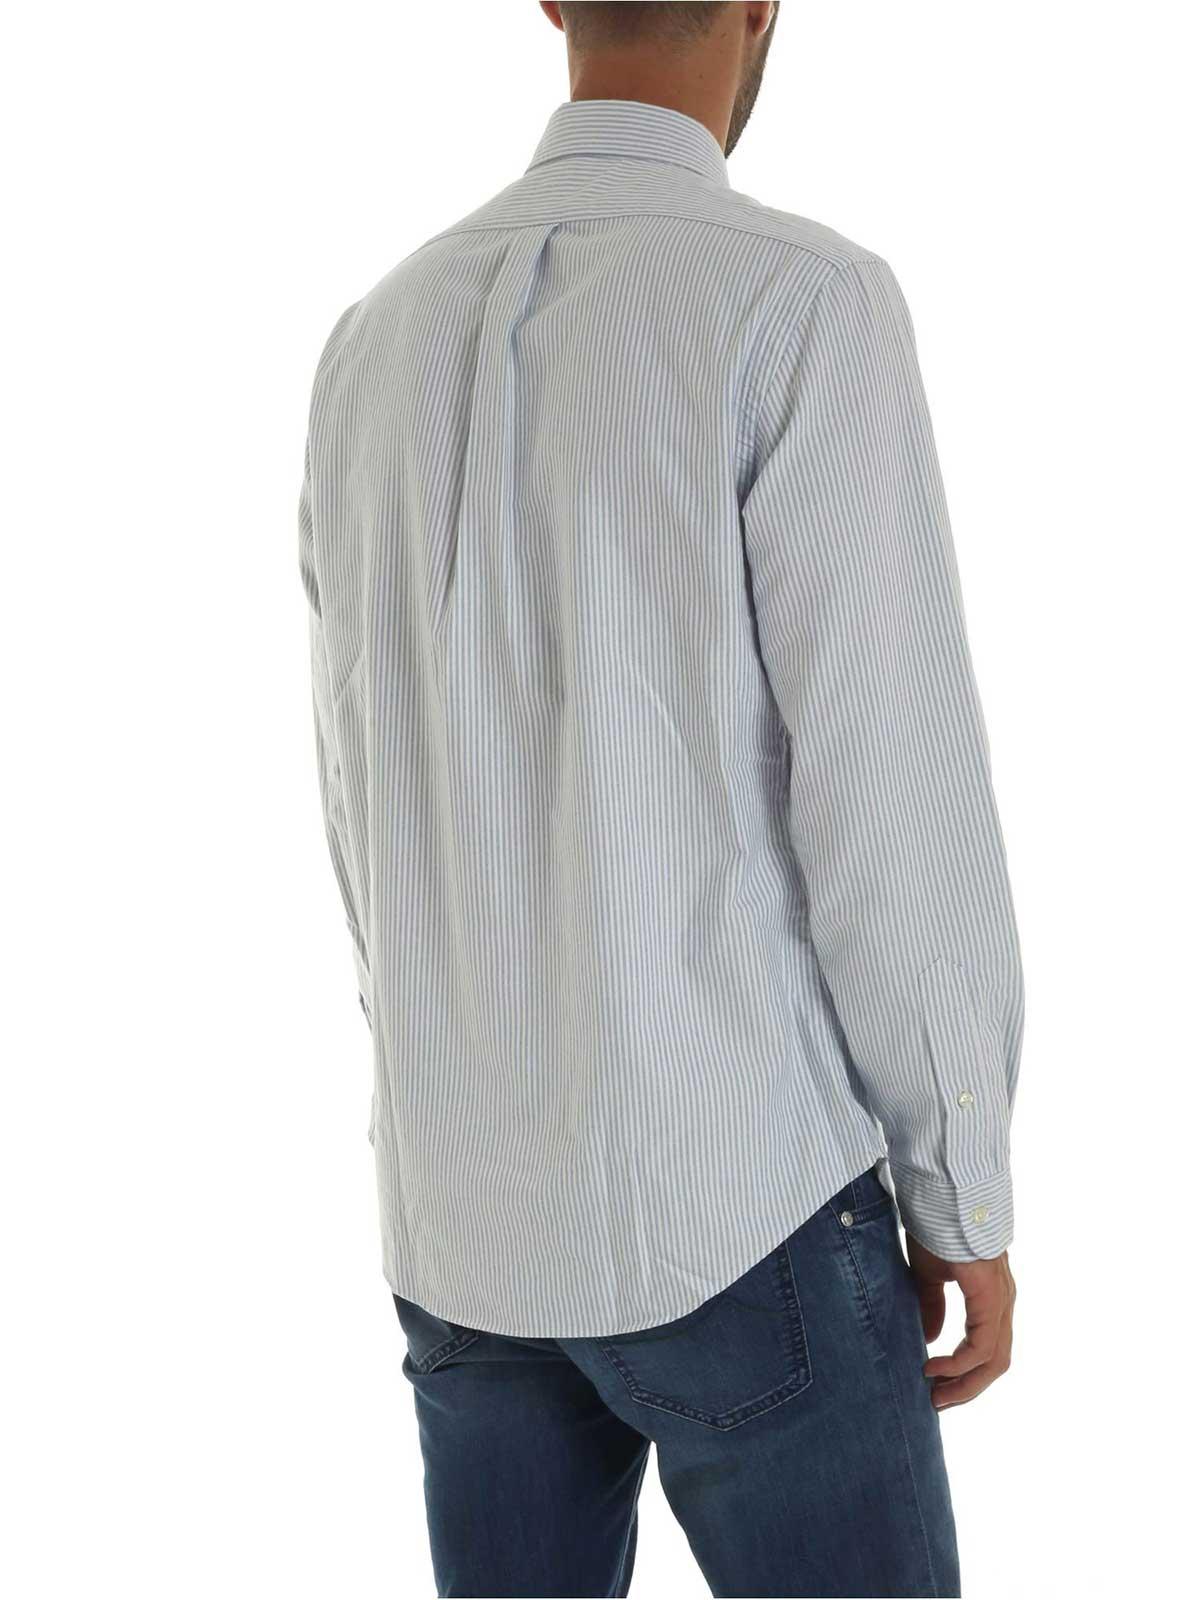 Picture of POLO RALPH LAUREN   Men's Striped Cotton Shirt